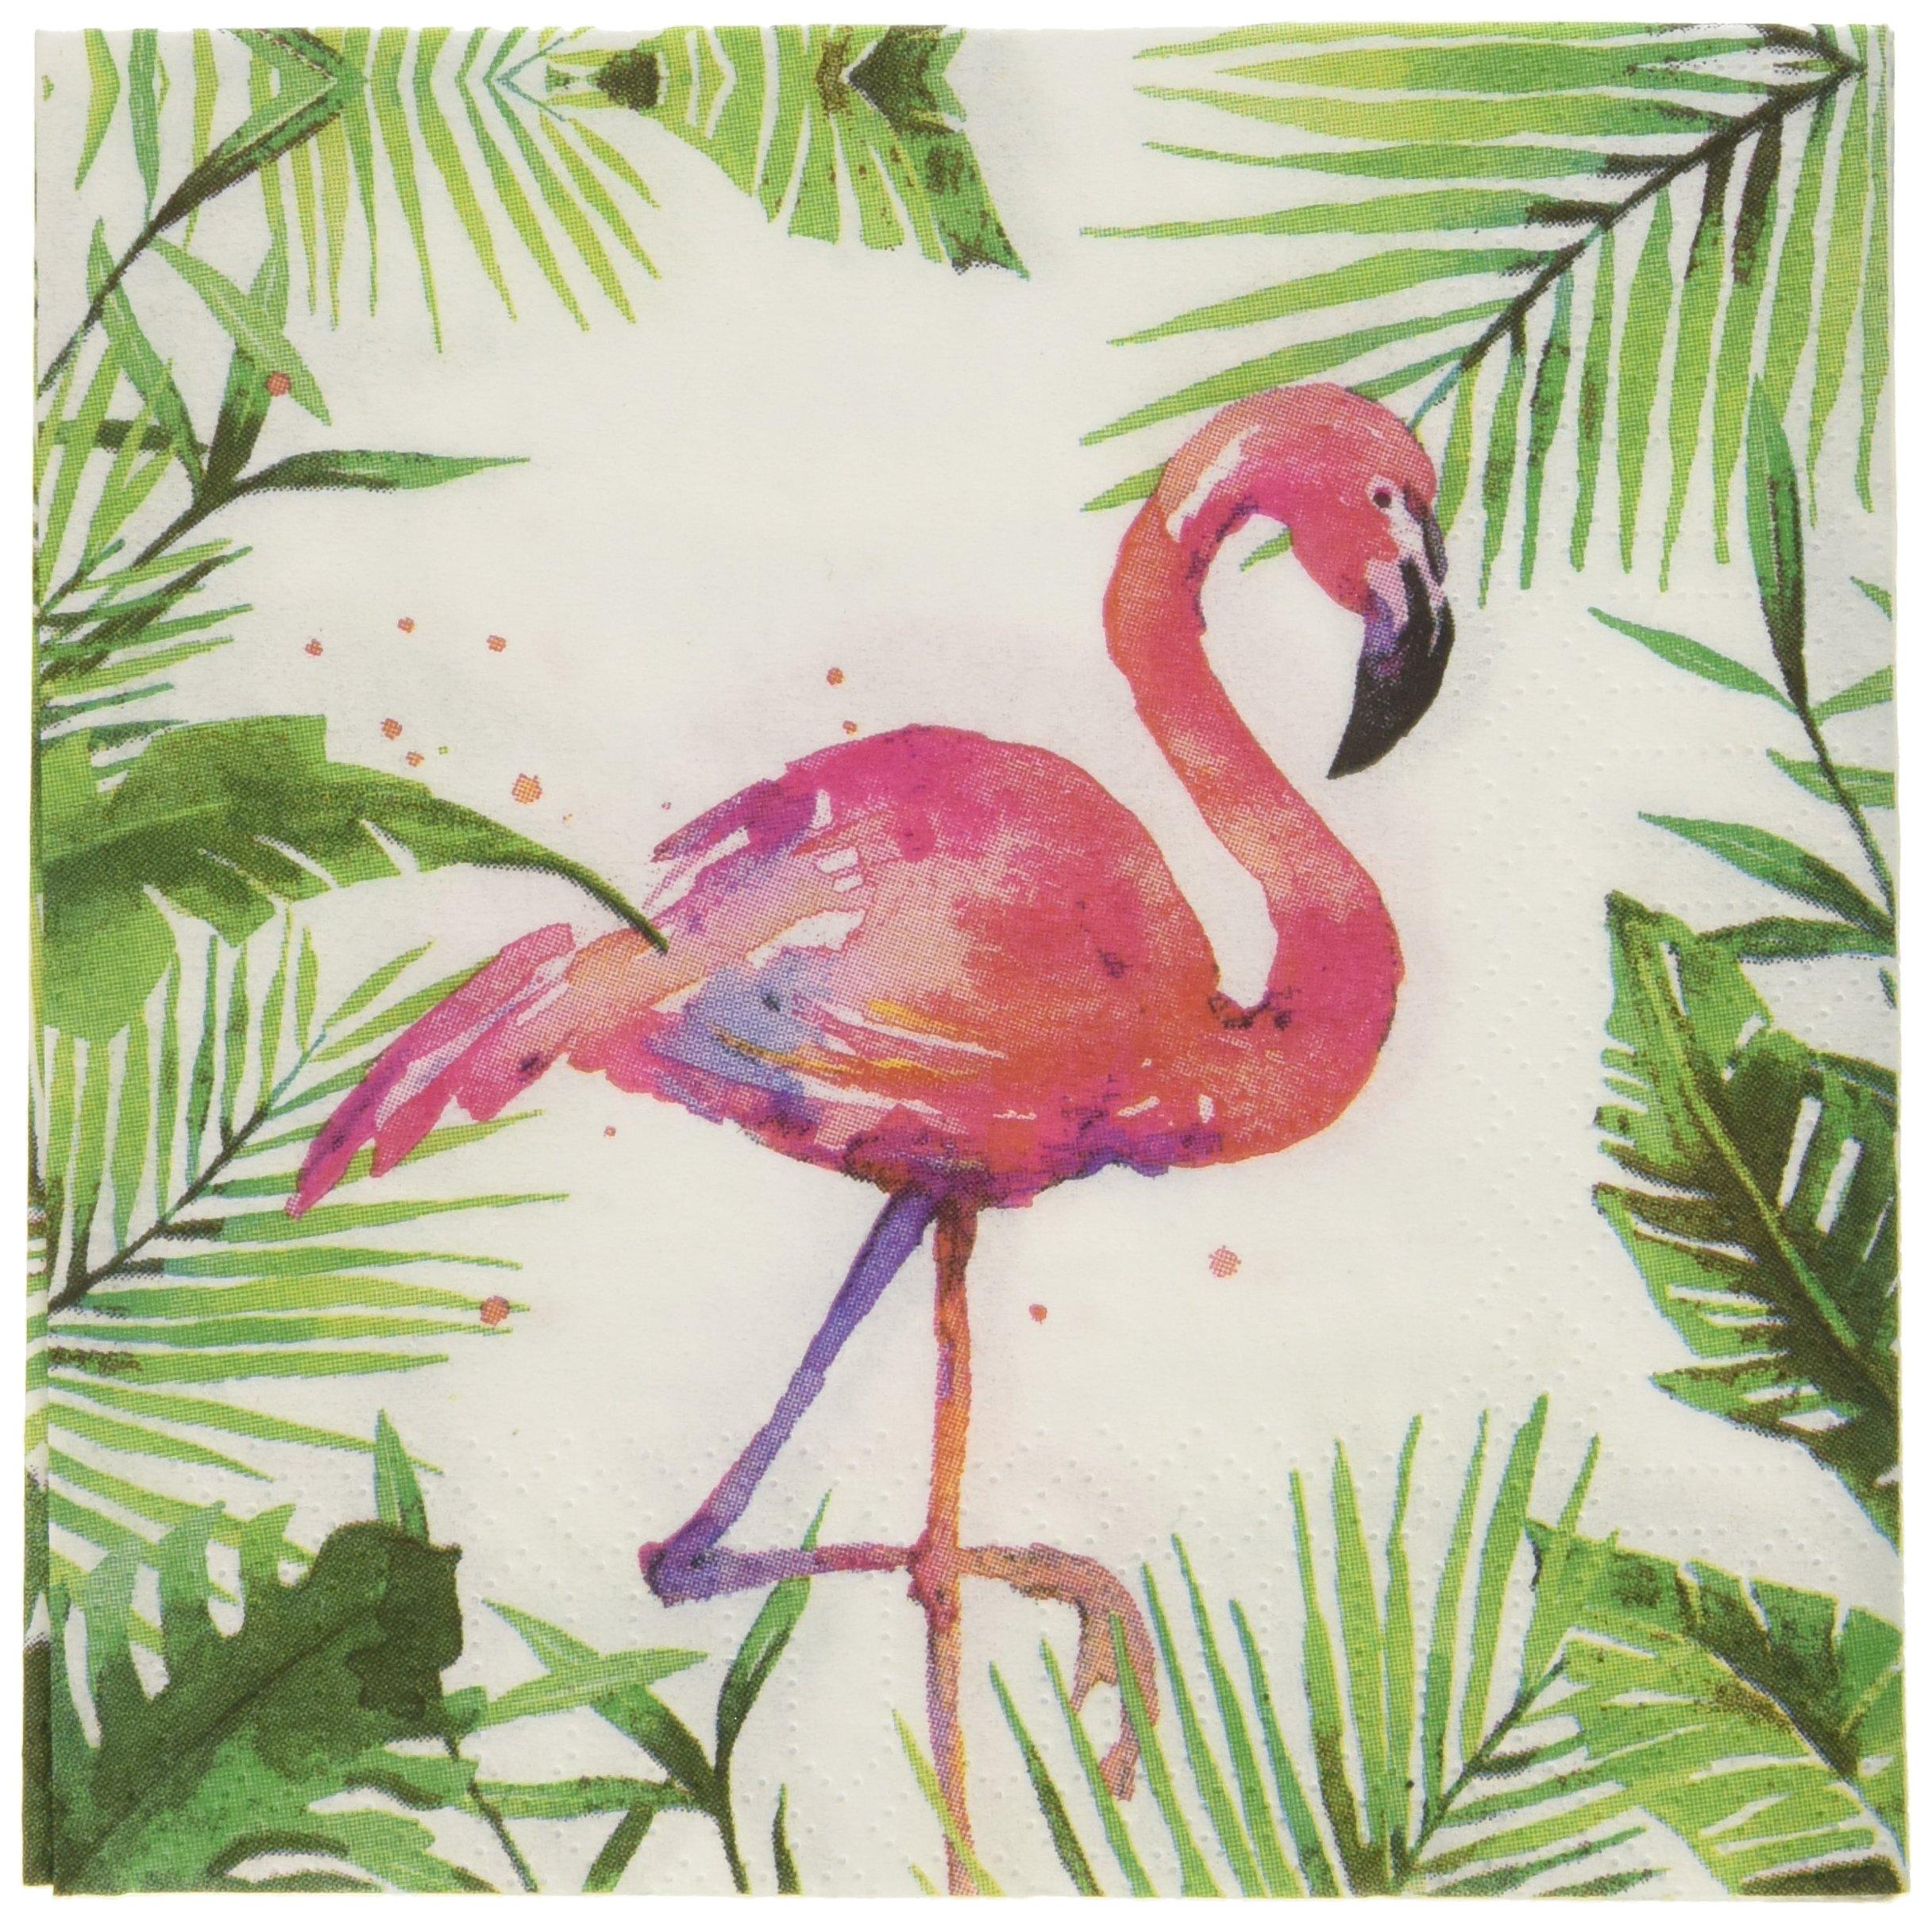 Paperproducts Design PPD 1252707 Tropical Flamingo Beverage/Cocktail Paper Napkins,5''x5'', Multicolor